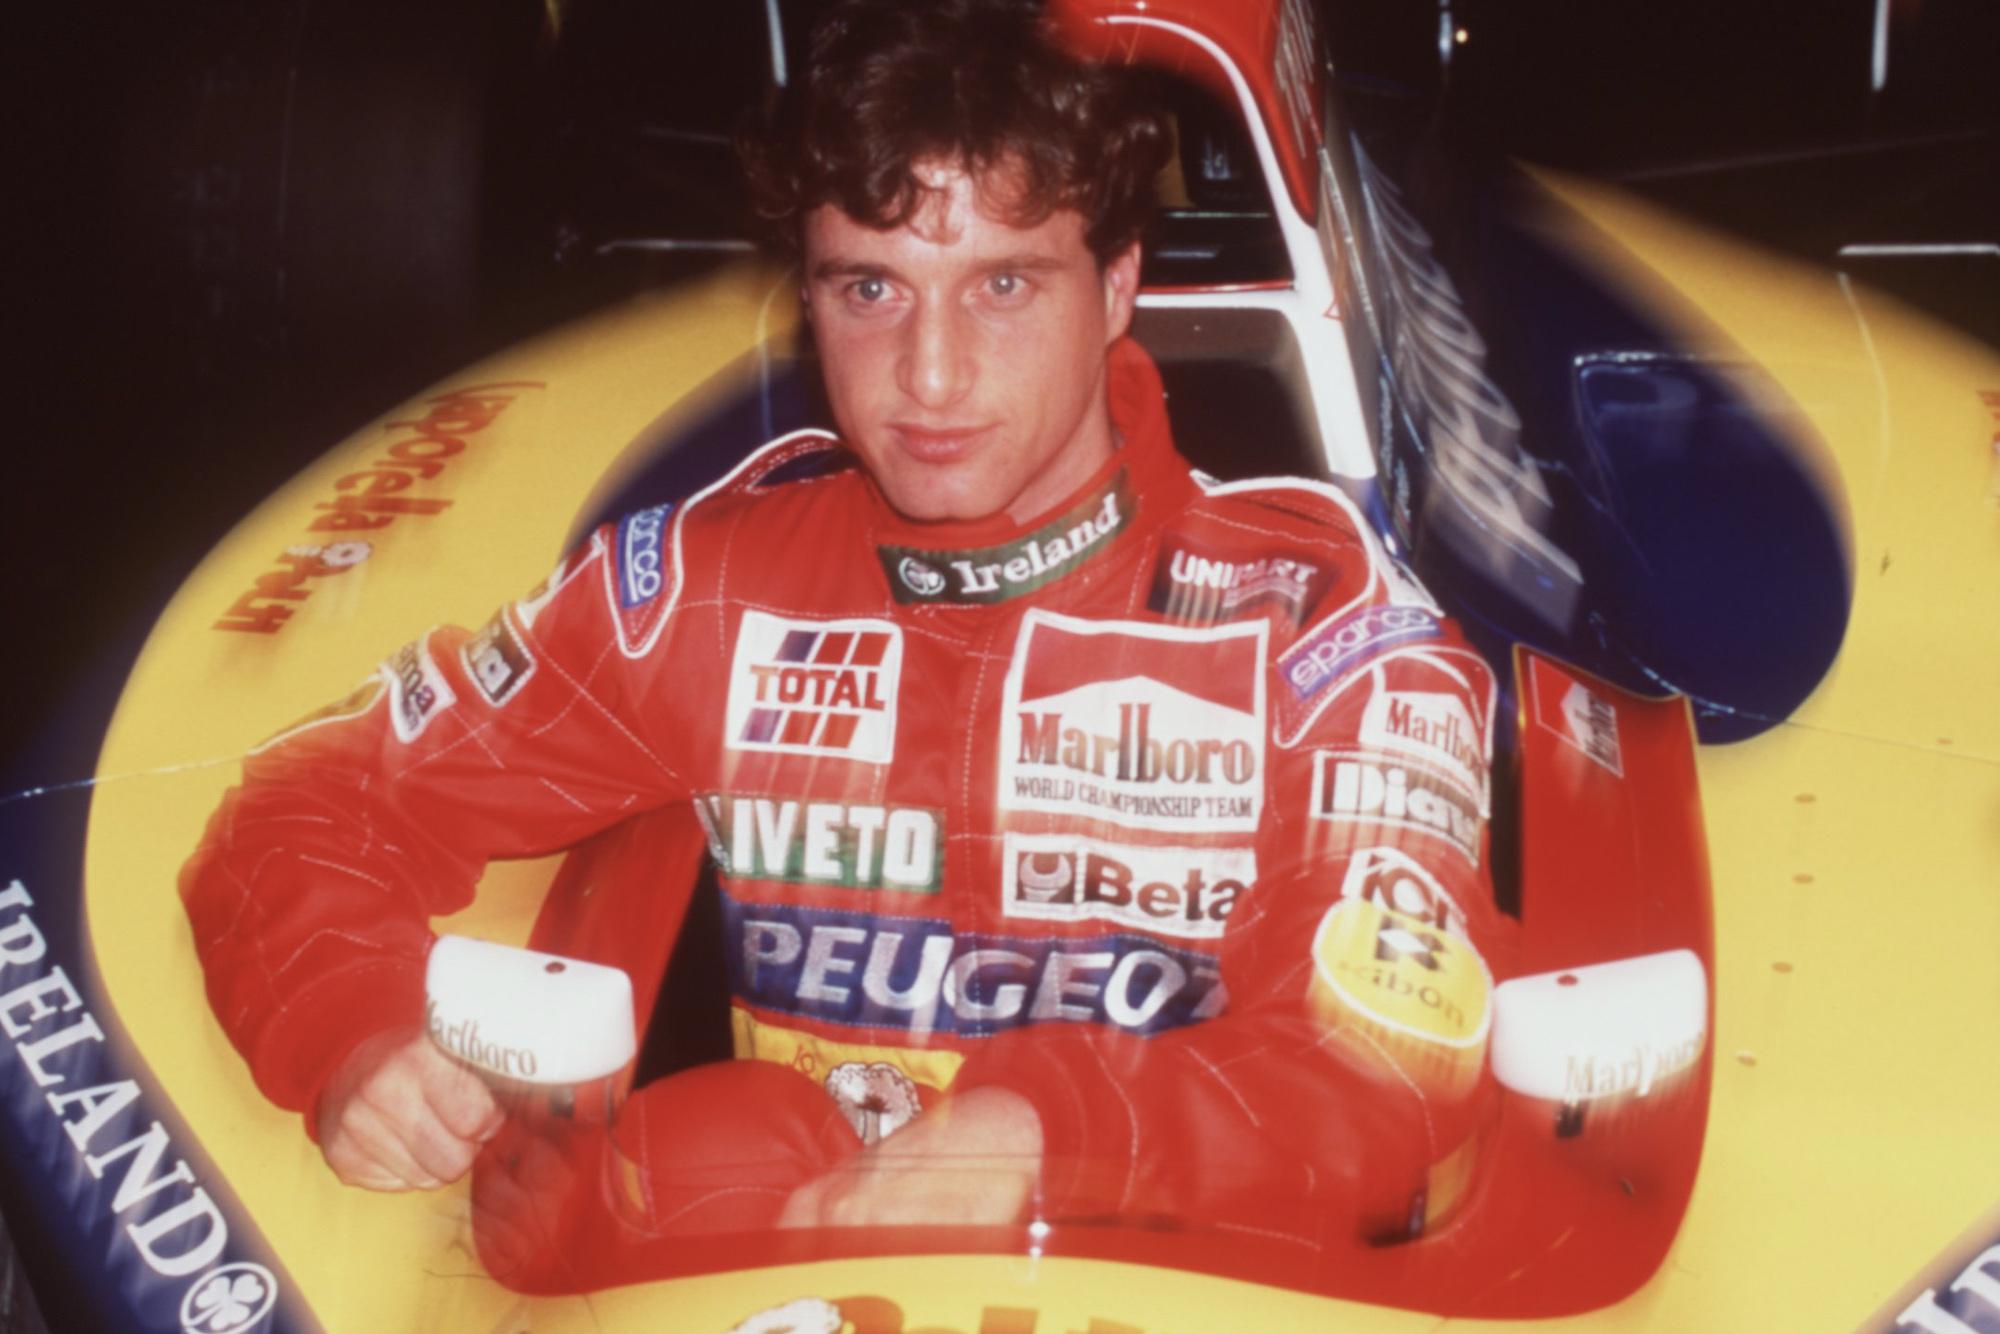 Eddie Irvine at the launch of the 1995 Jordan